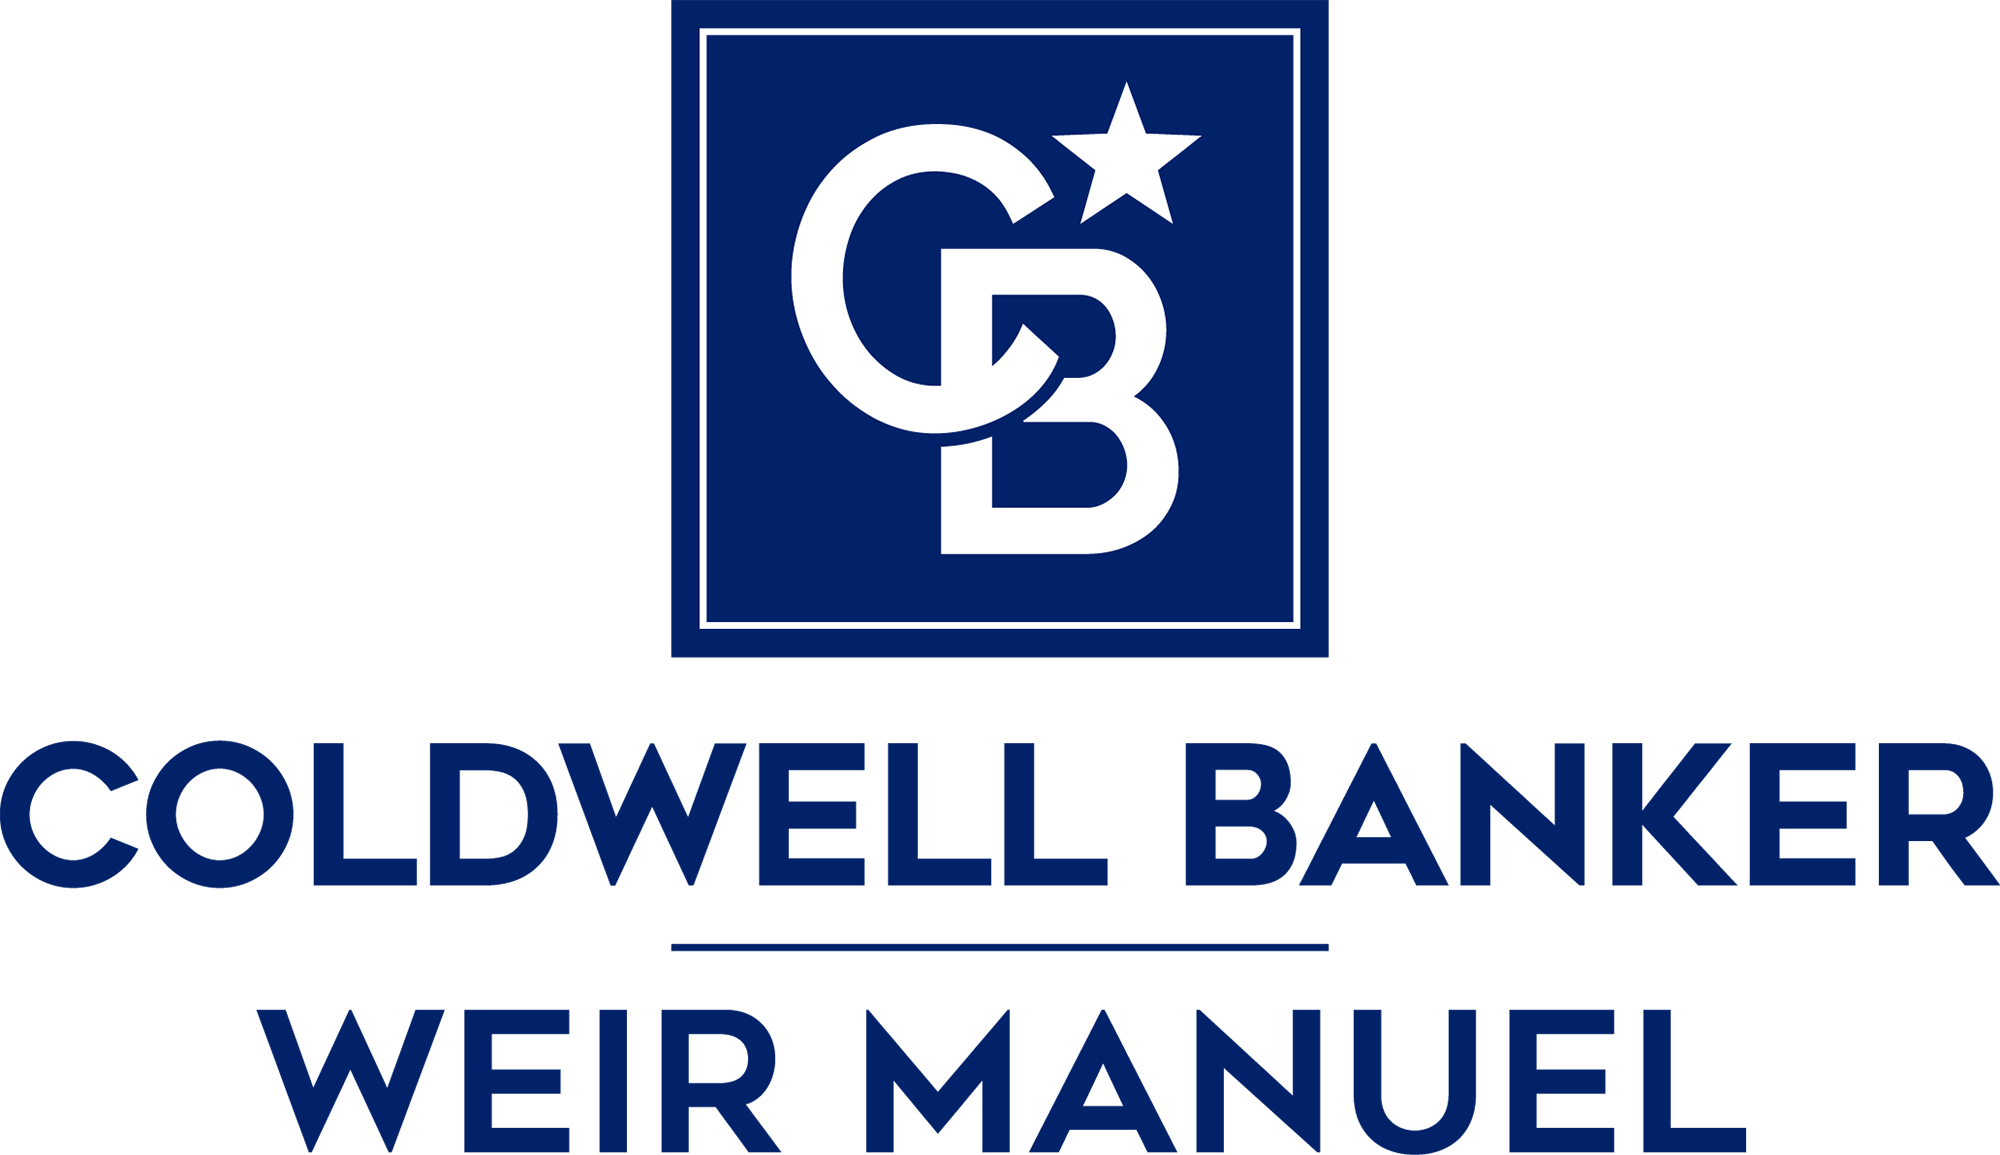 cbwm03 Logo